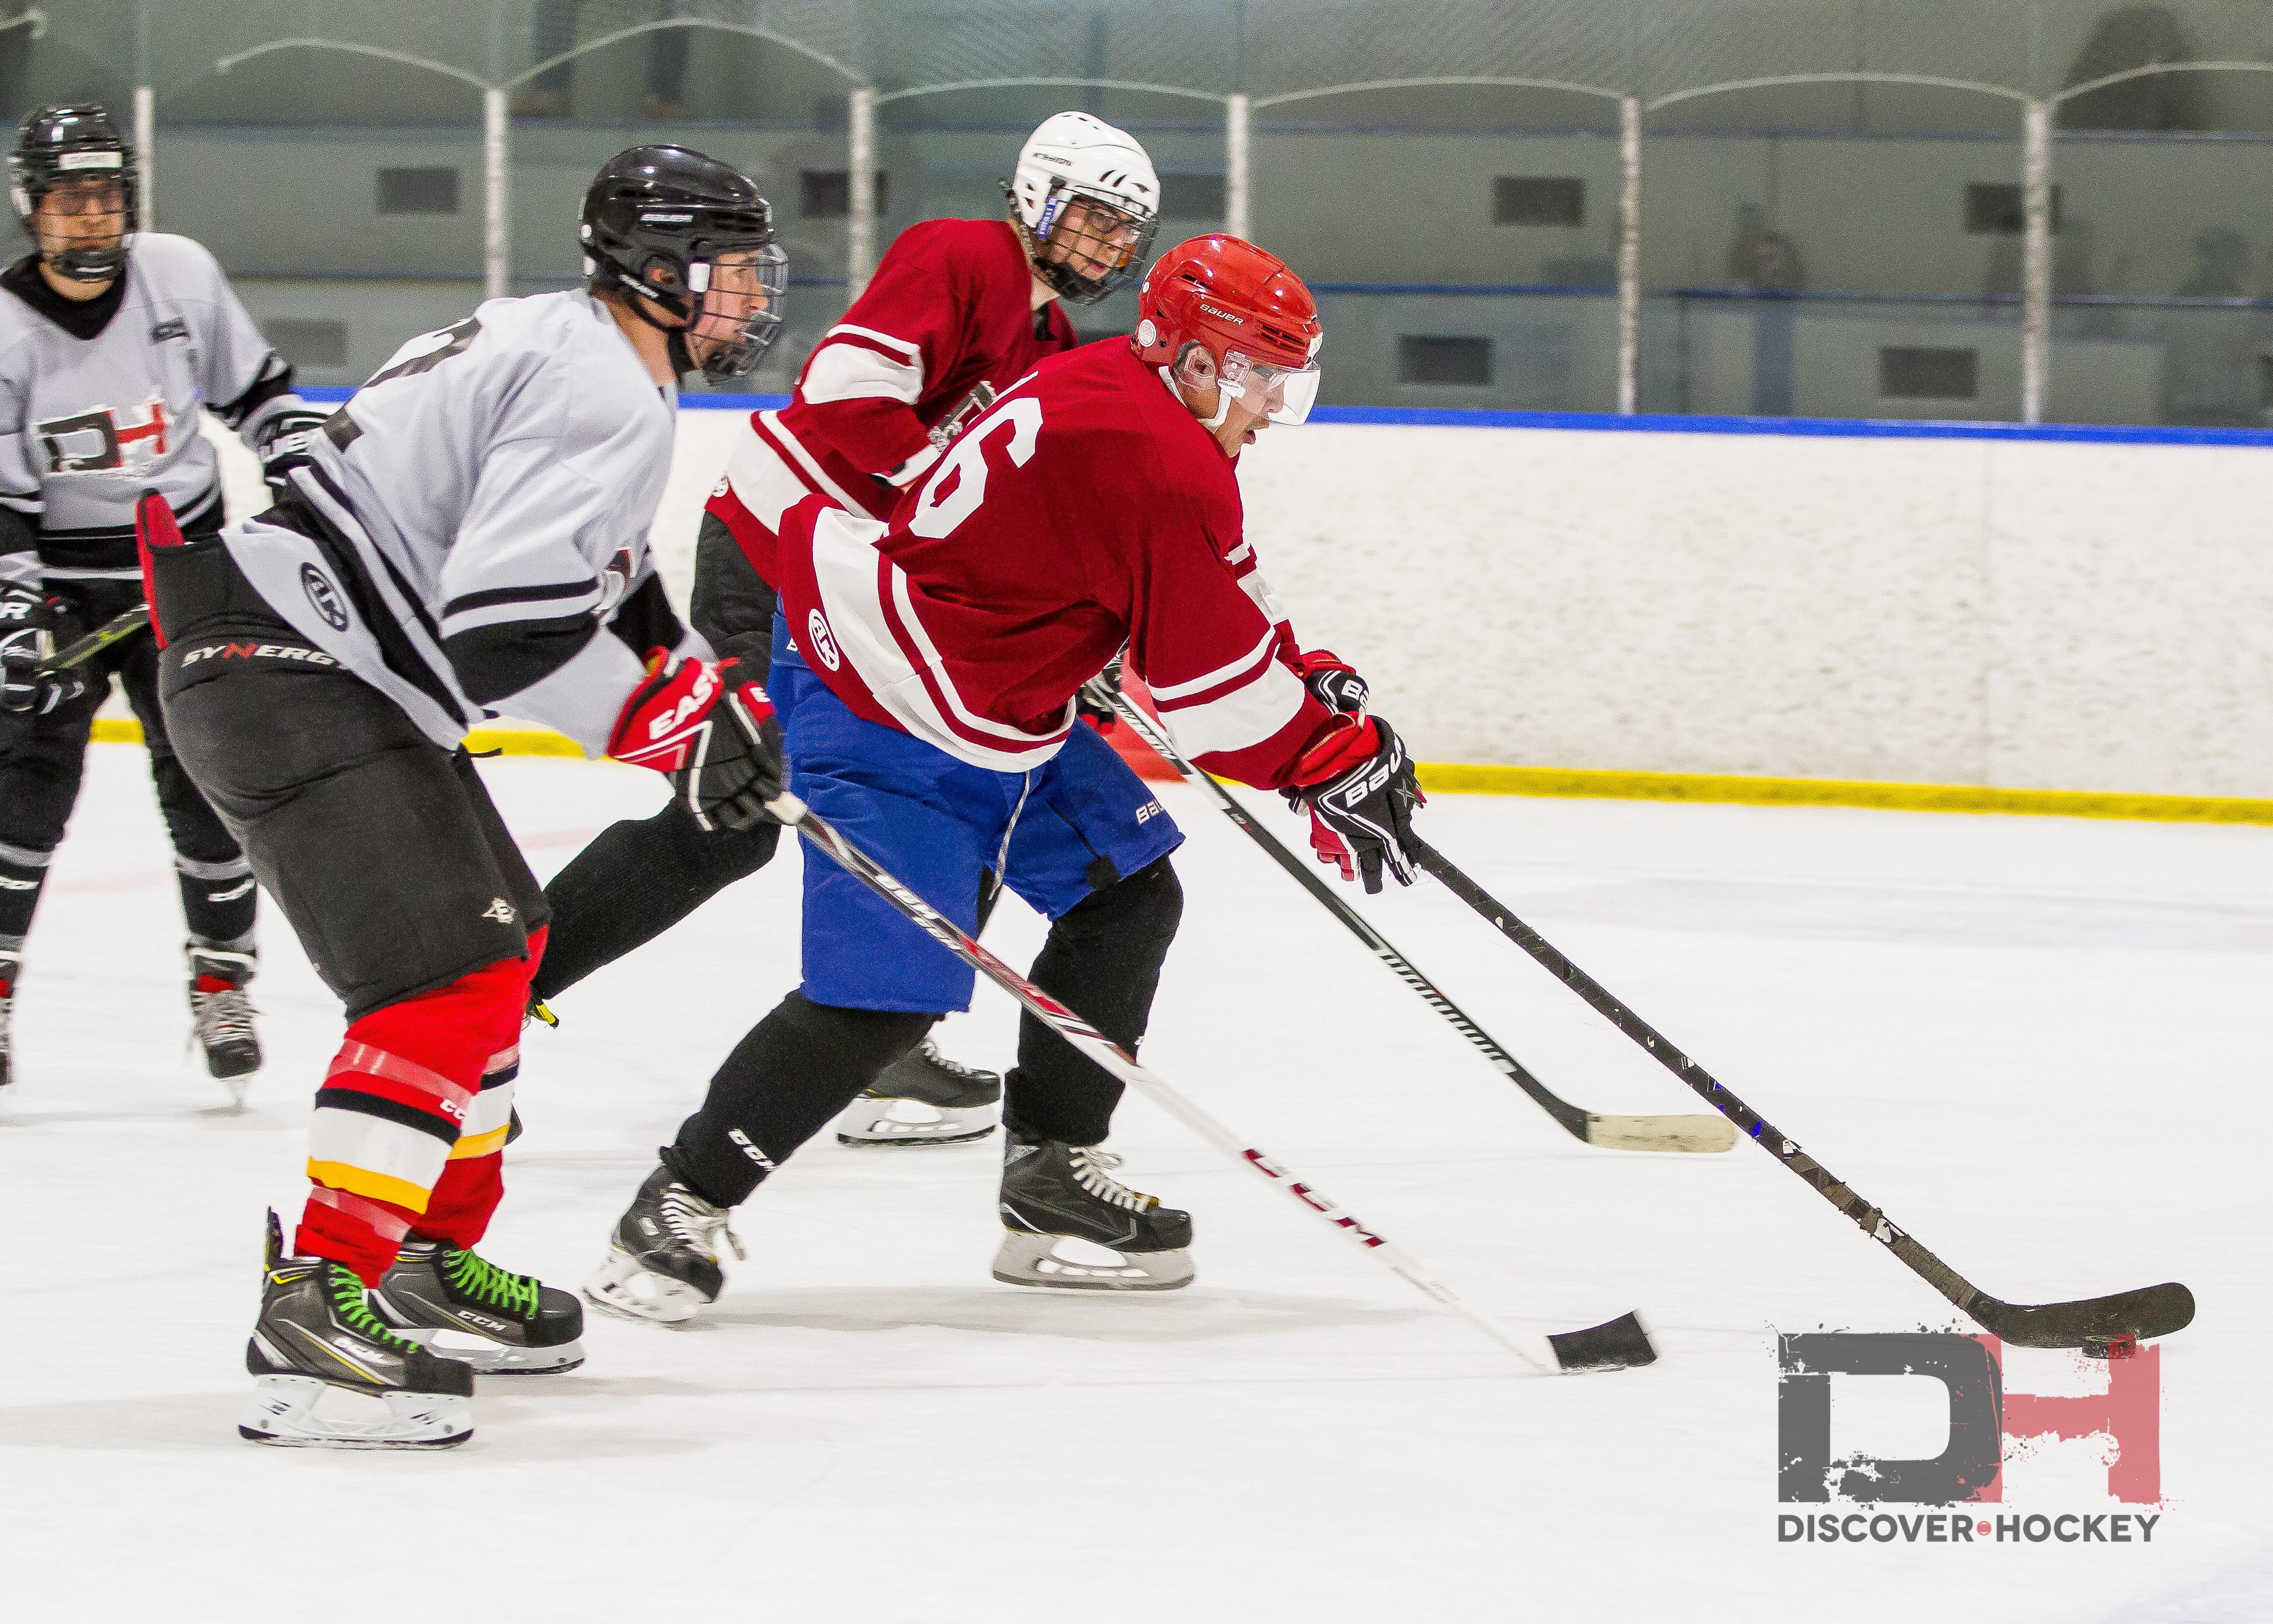 Massage adult beginner hockey nude